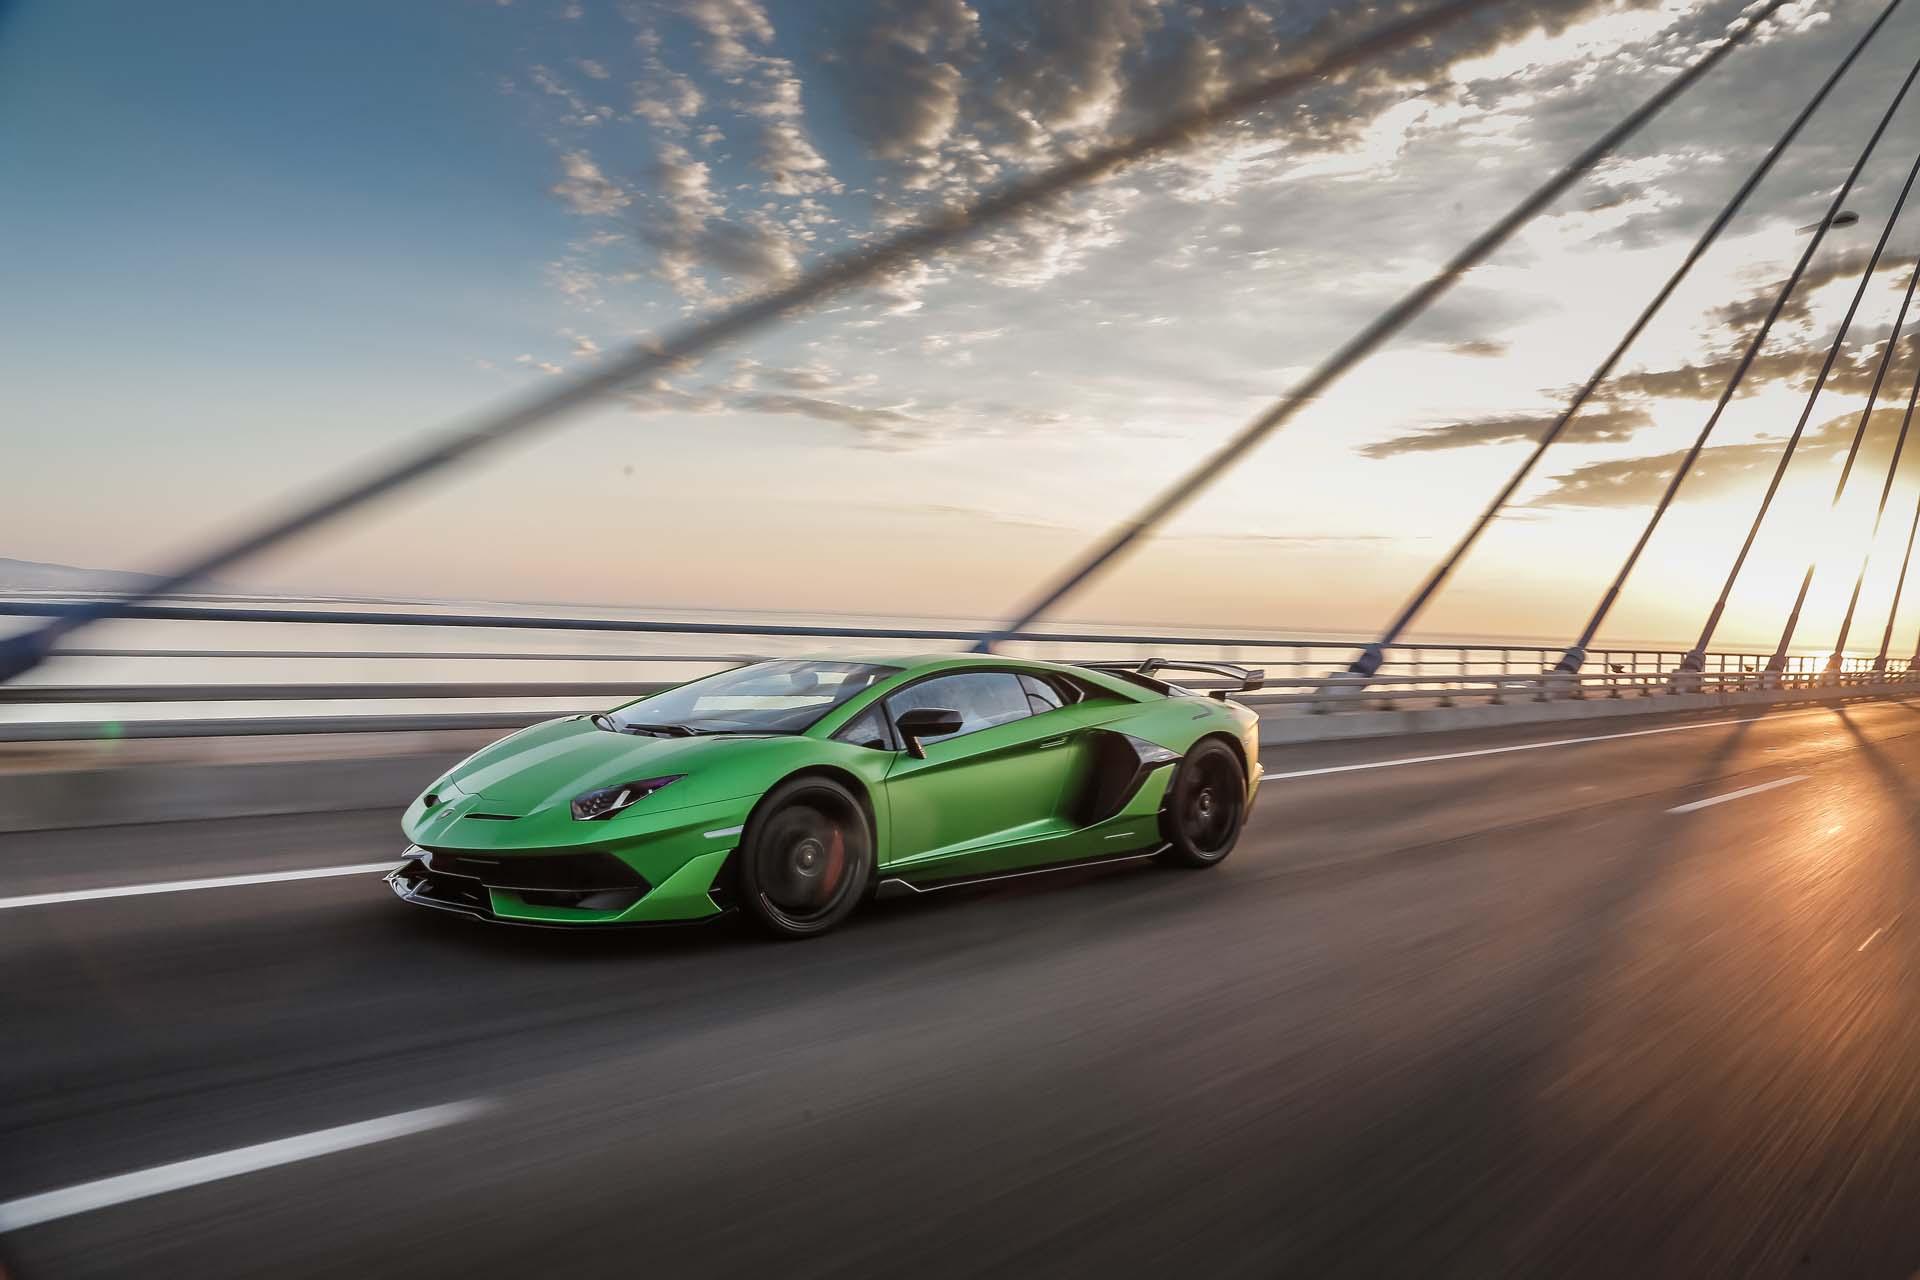 2019 Lamborghini Aventador SVJ Front Three-Quarter Wallpapers #44 of 241